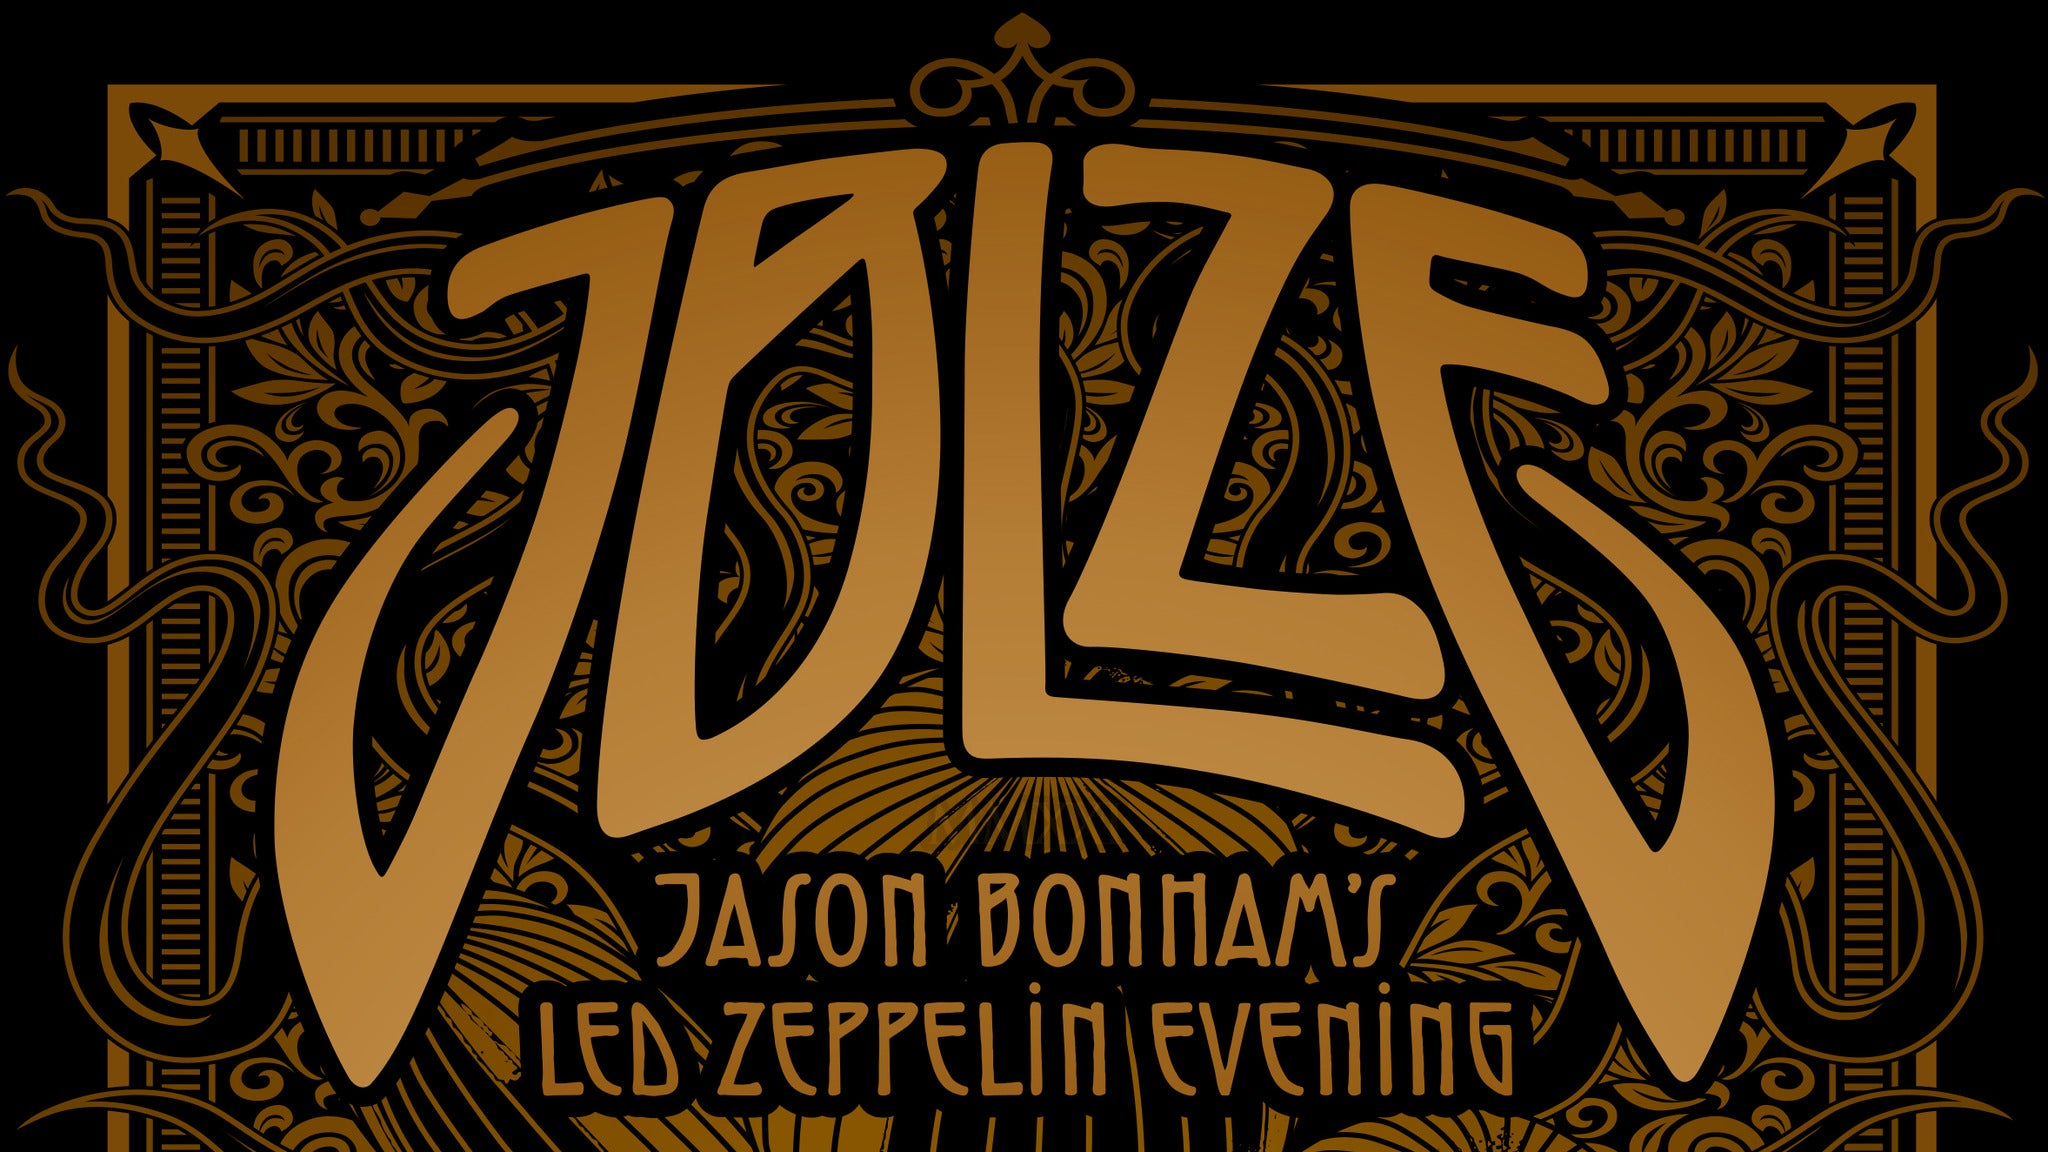 Jason Bonham's Led Zeppelin Evening at Ridgefield Playhouse